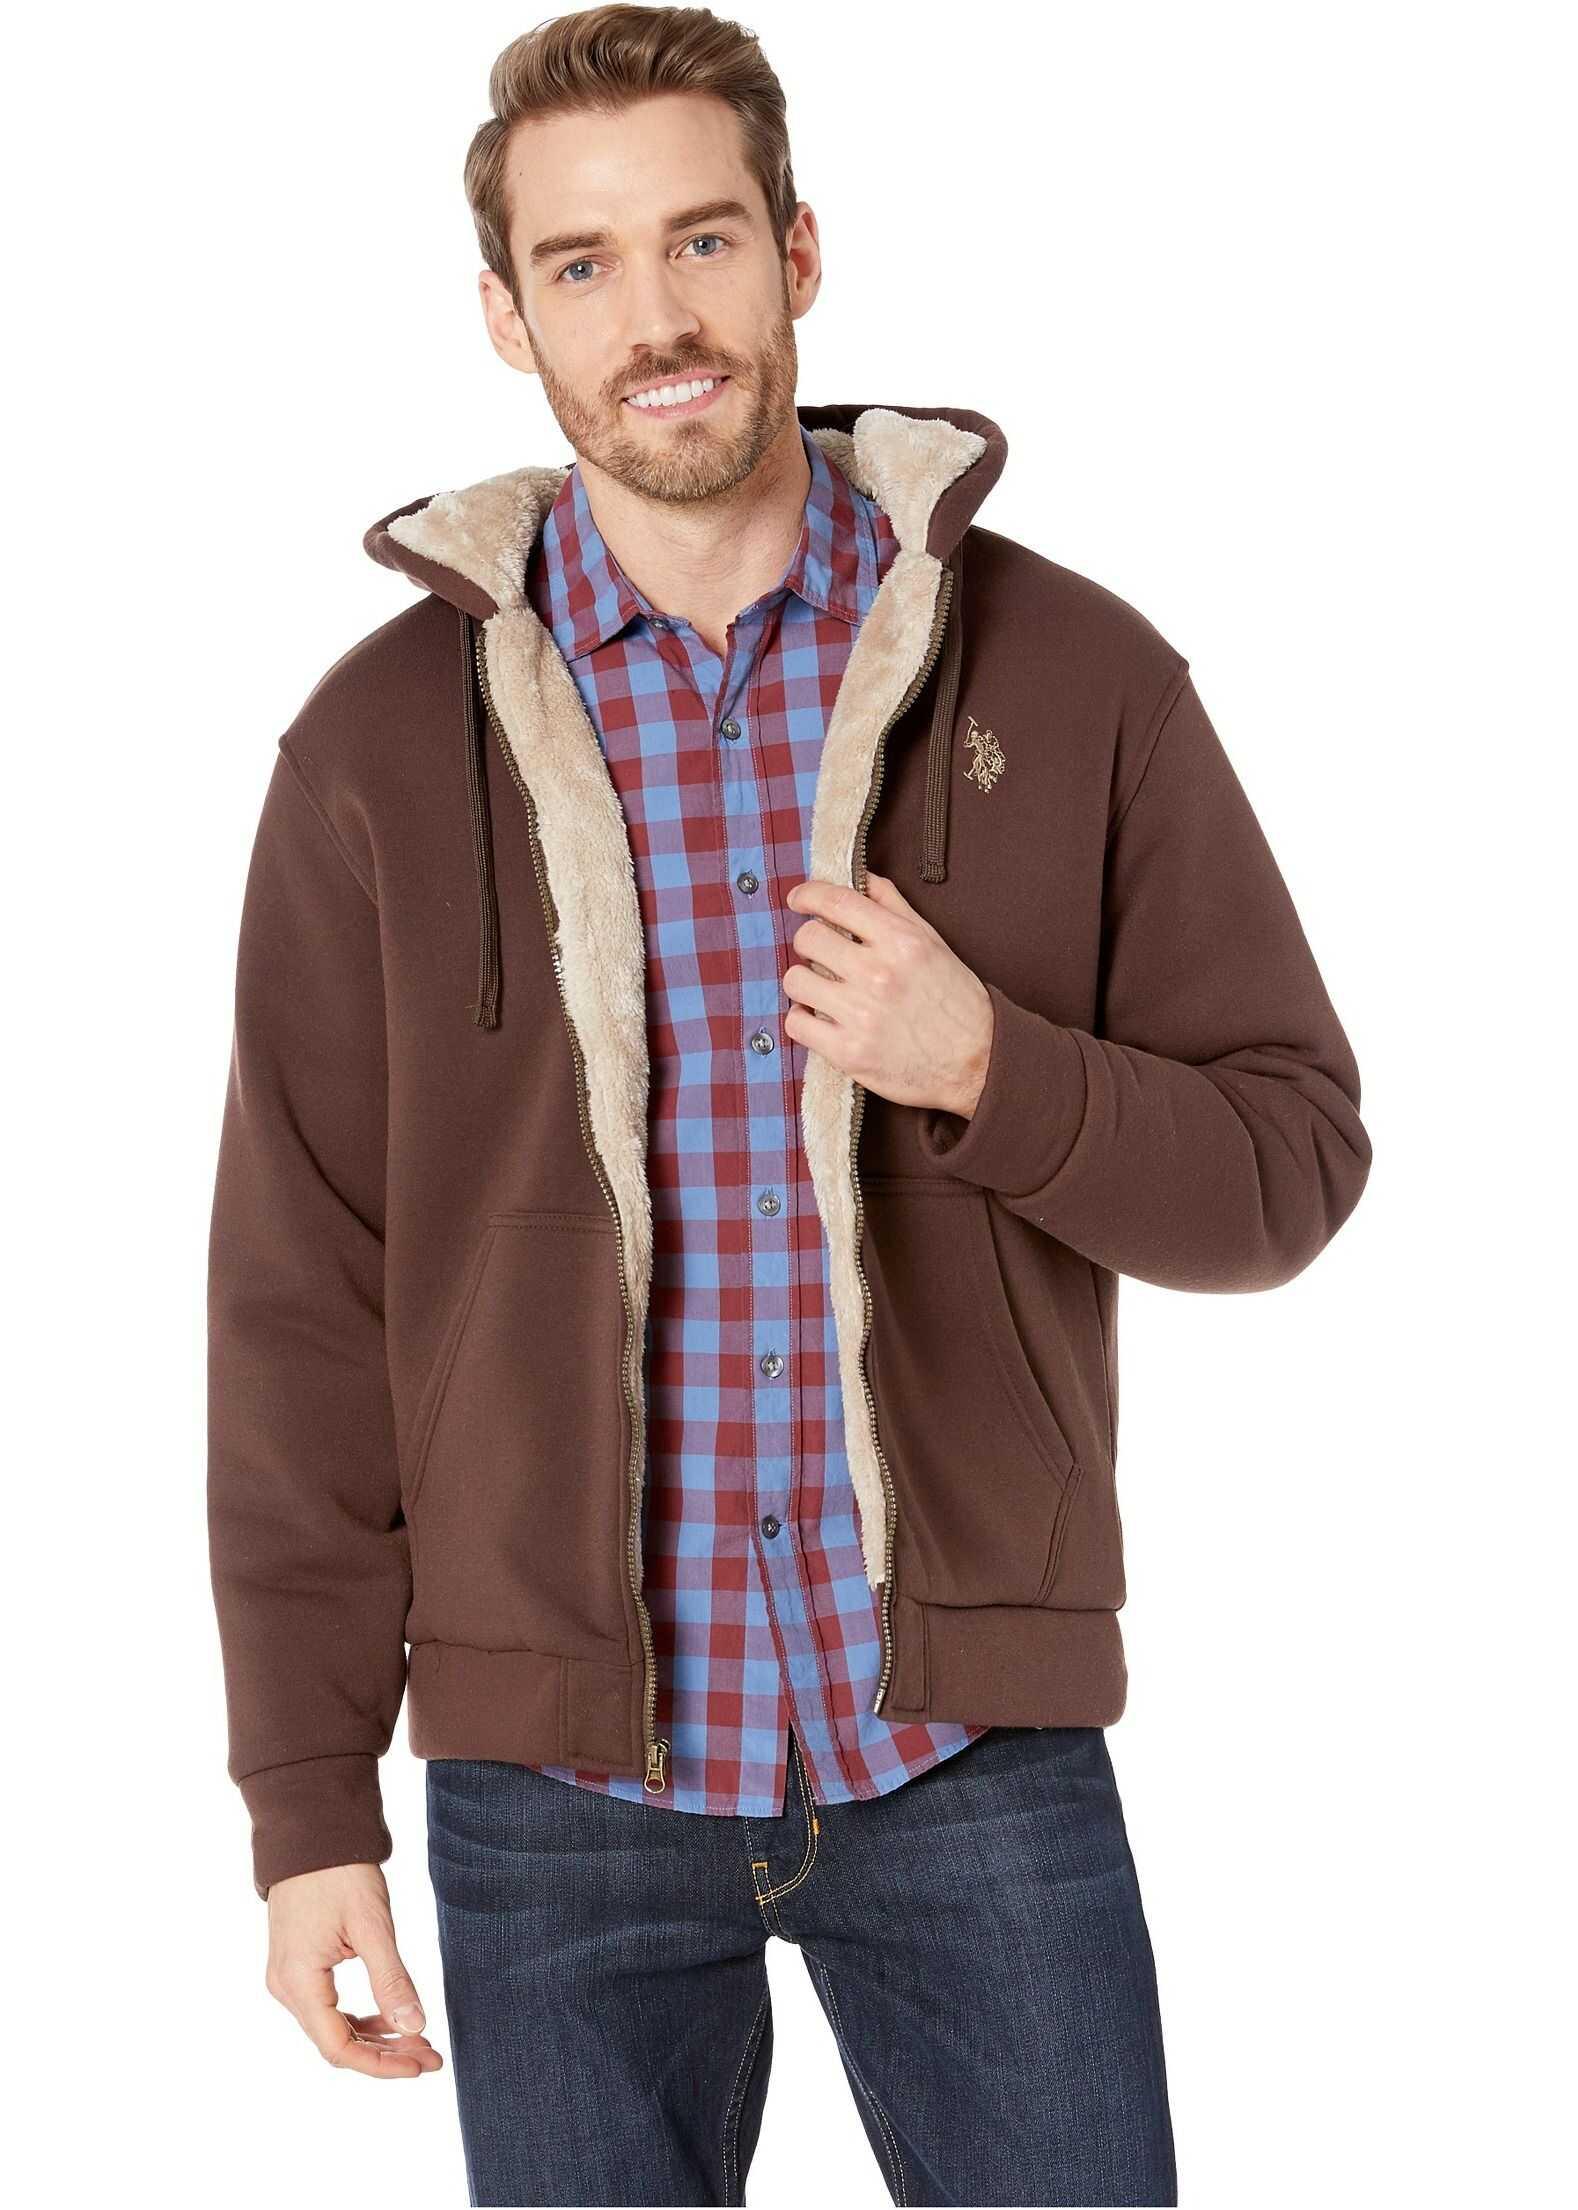 U.S. POLO ASSN. Solid Lined Fleece Dark Brown